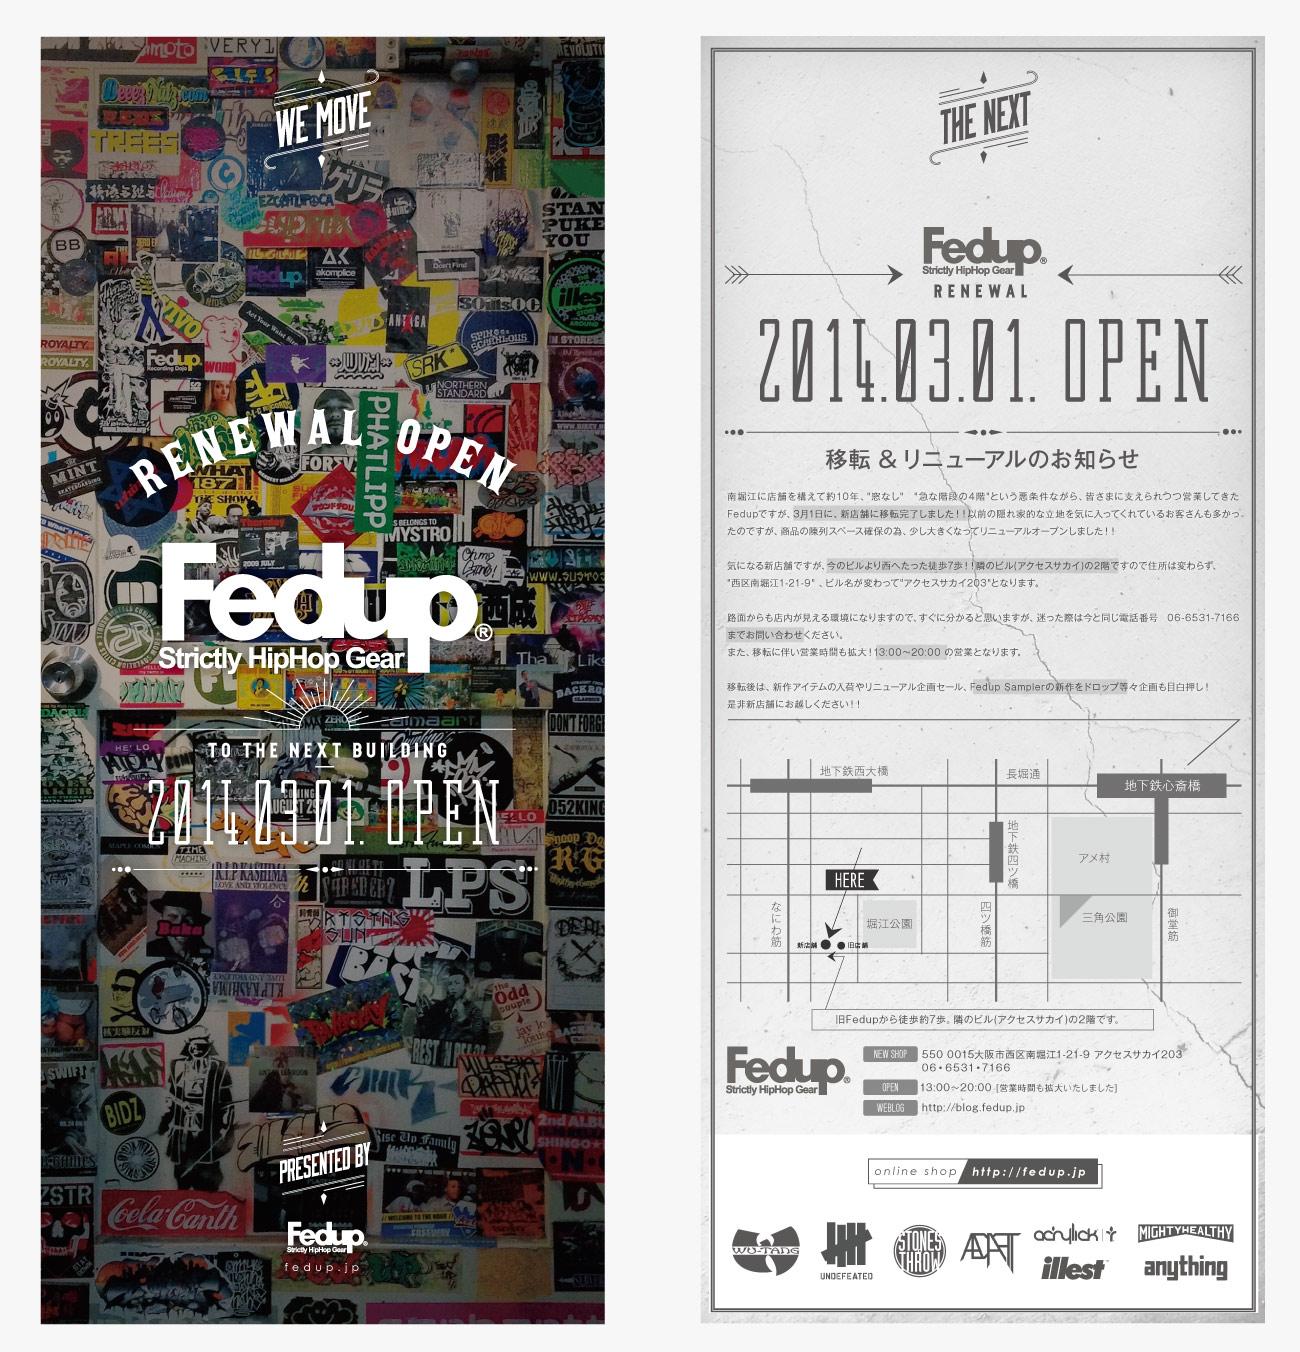 Fedup | renewalのフライヤー